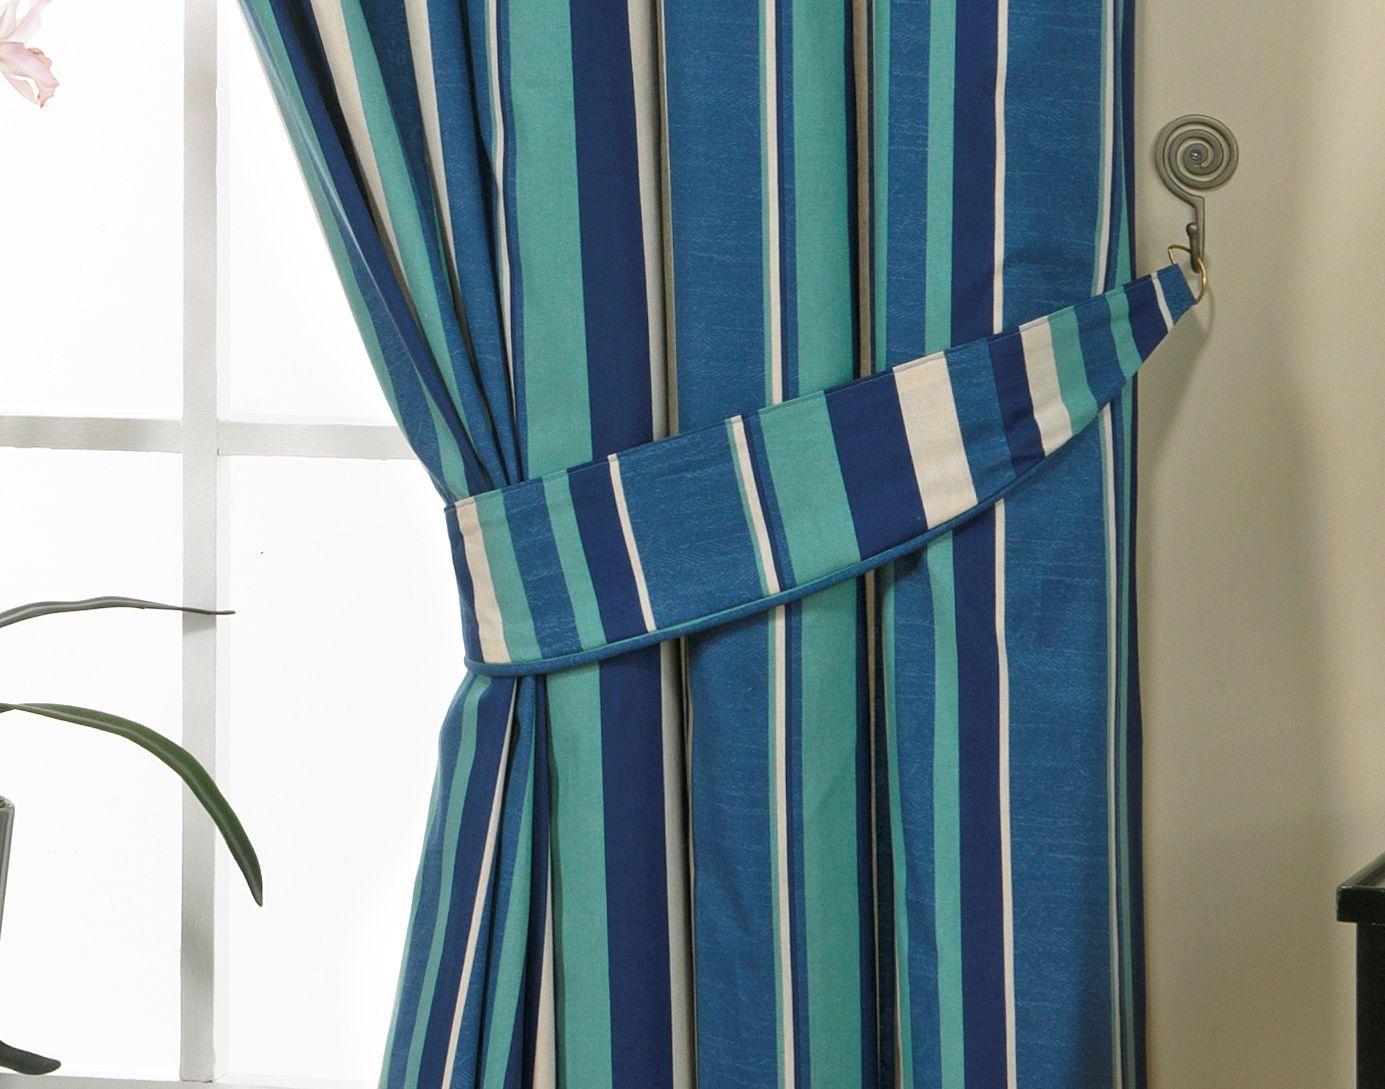 Blue Striped Curtains Arrangement Invado International How To